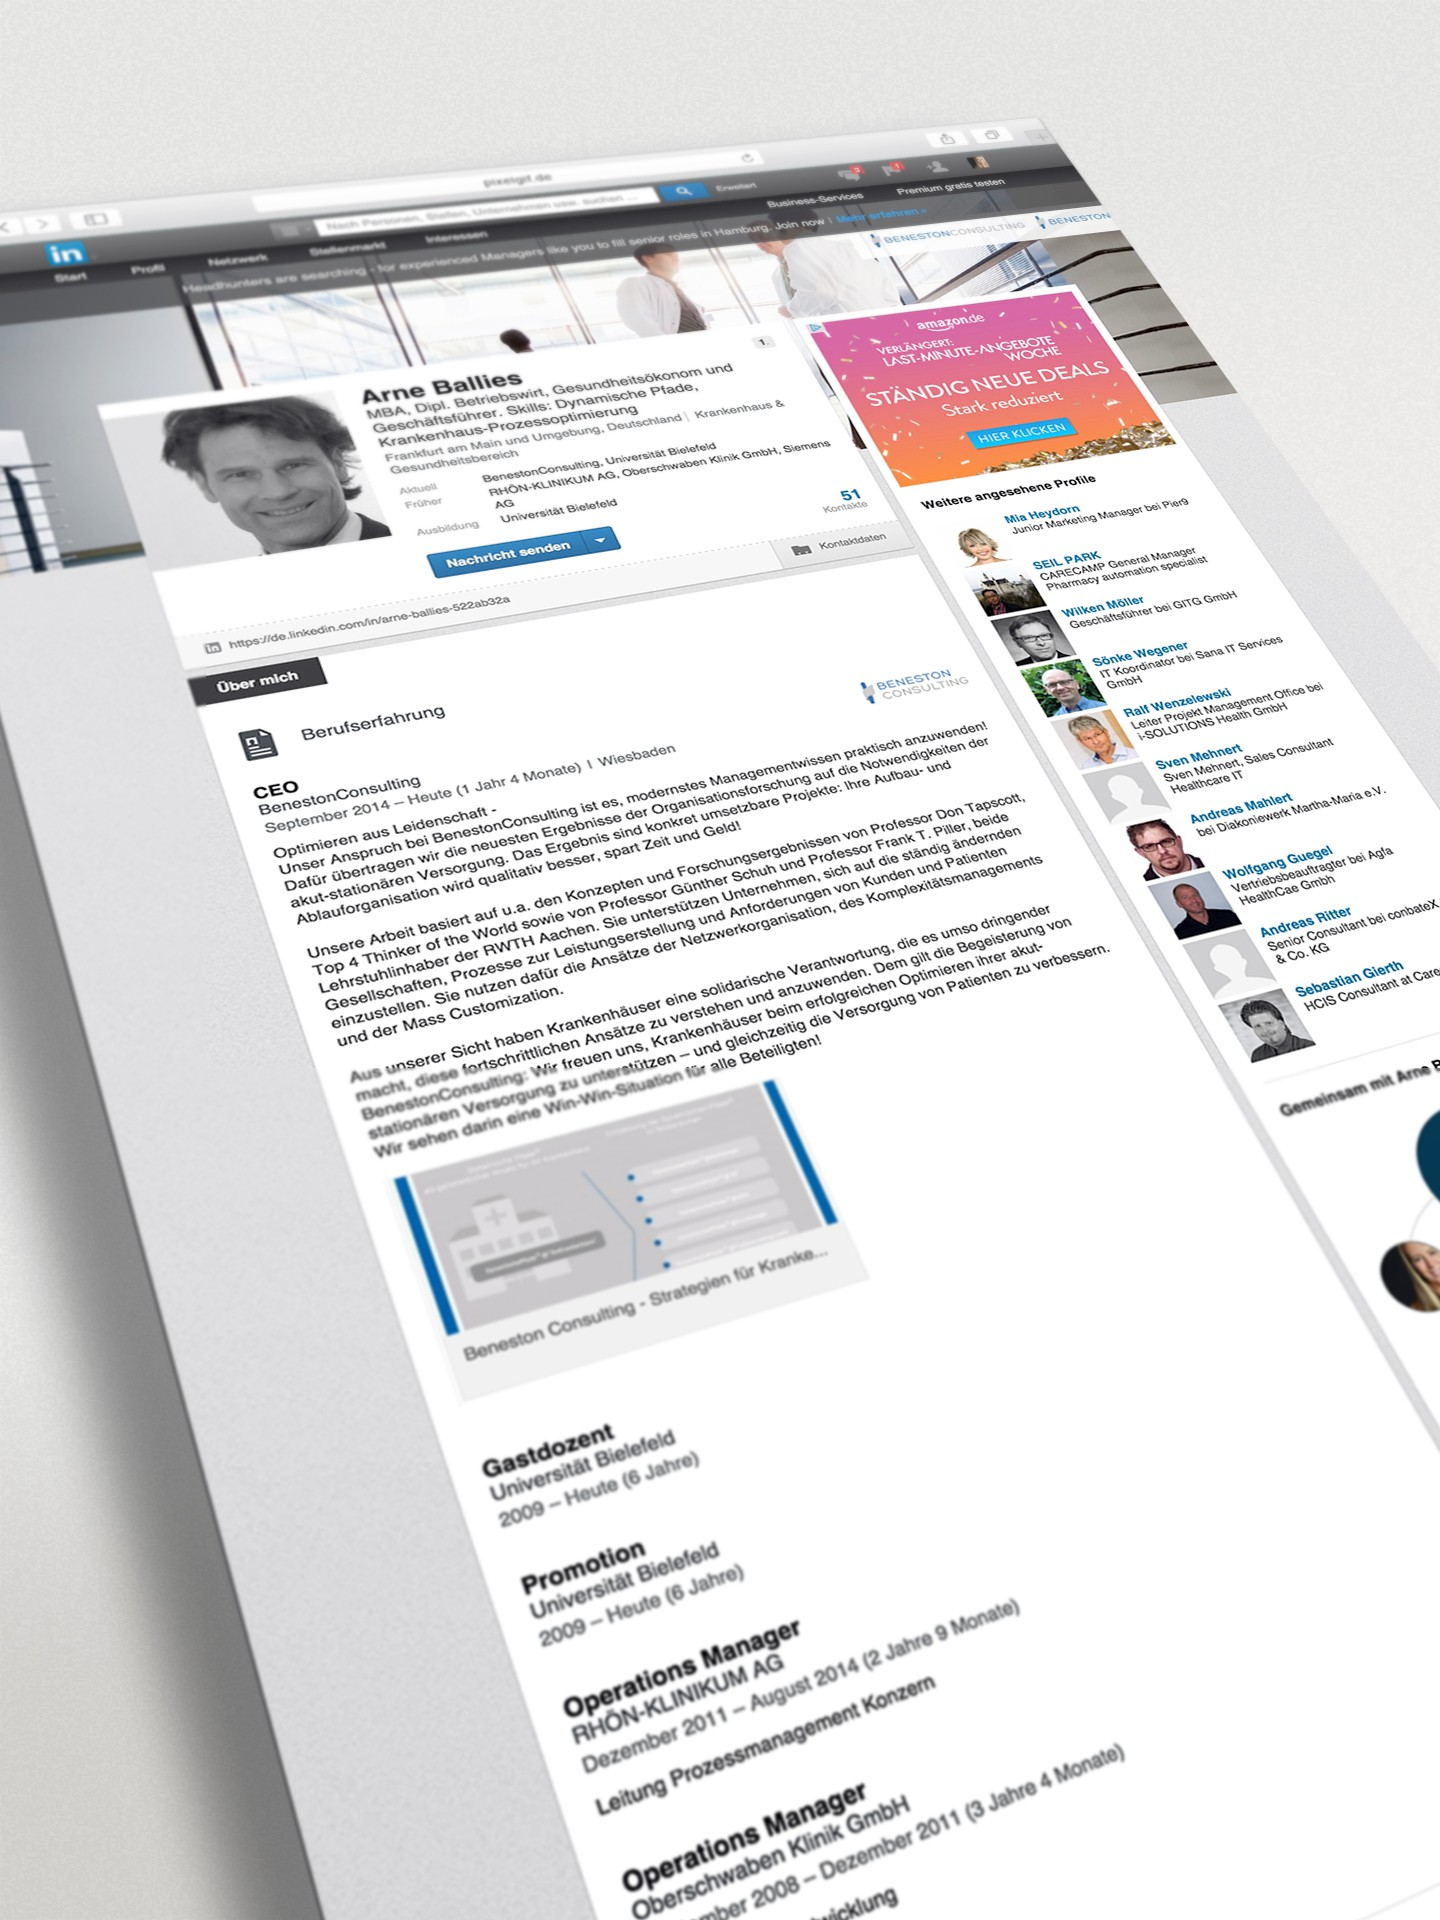 BenestonReseach Social Media Auftritt LinkedIn Profil